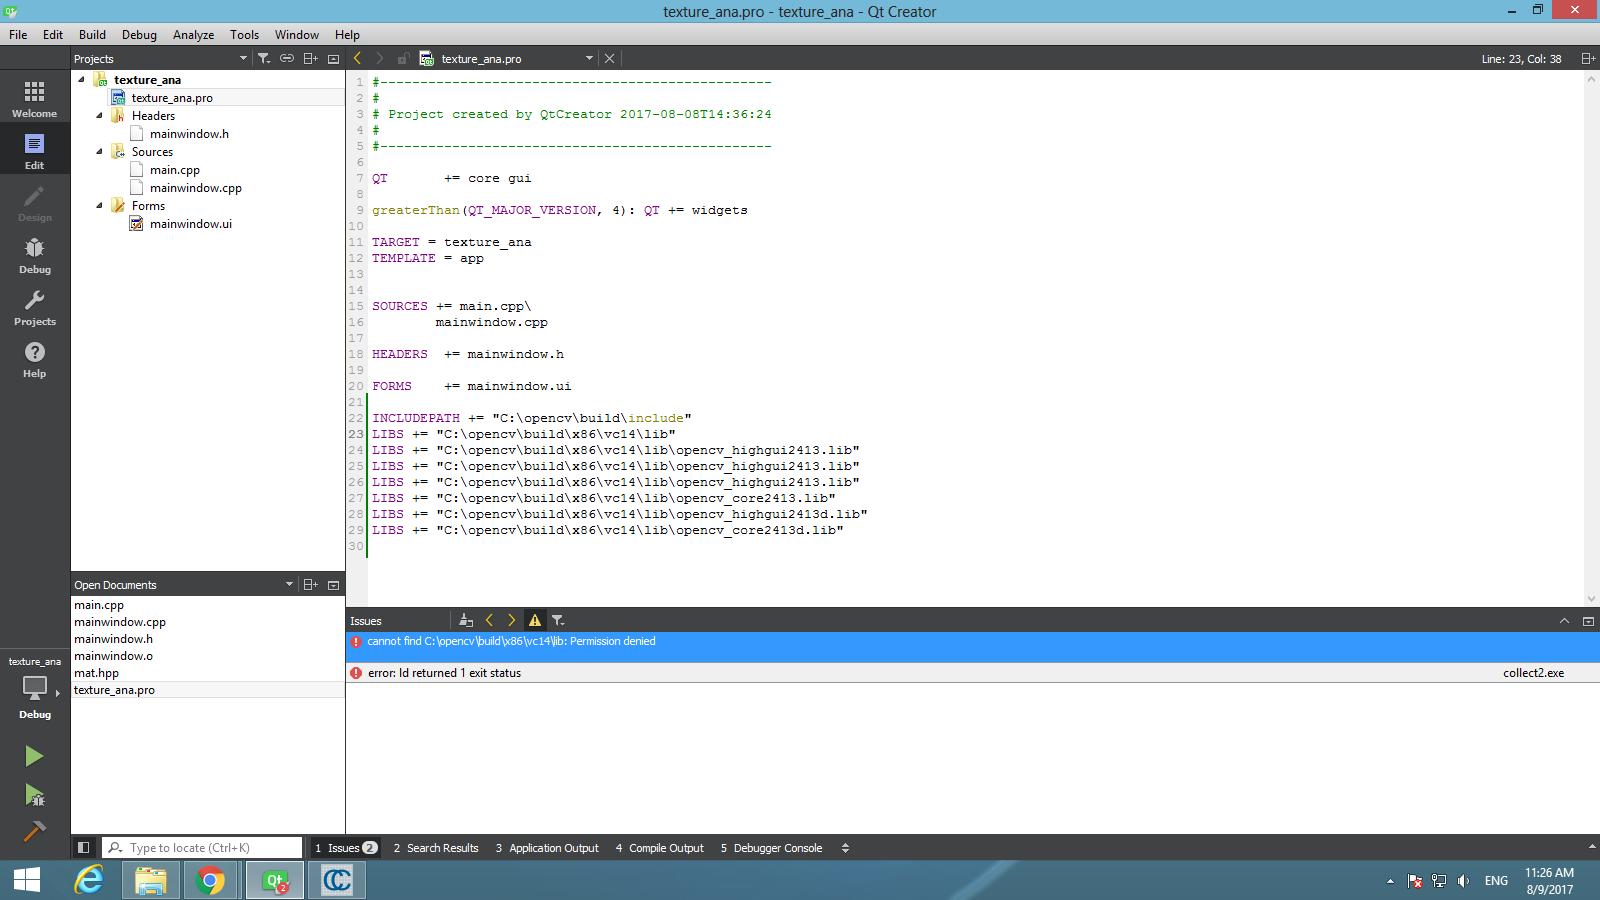 0_1502258265060_Screenshot (5).png